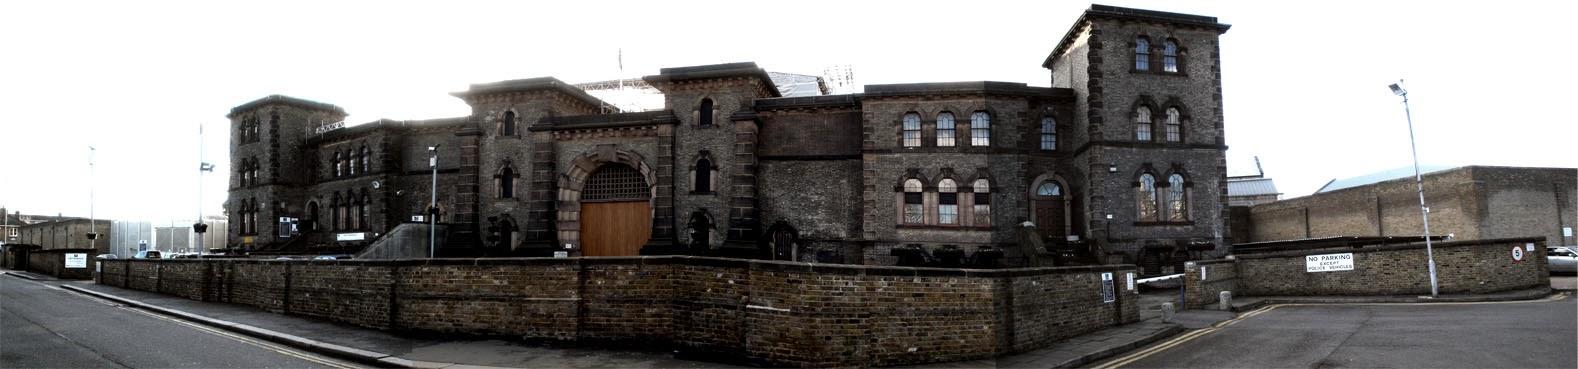 Panoramic view of Wandsworth Prison